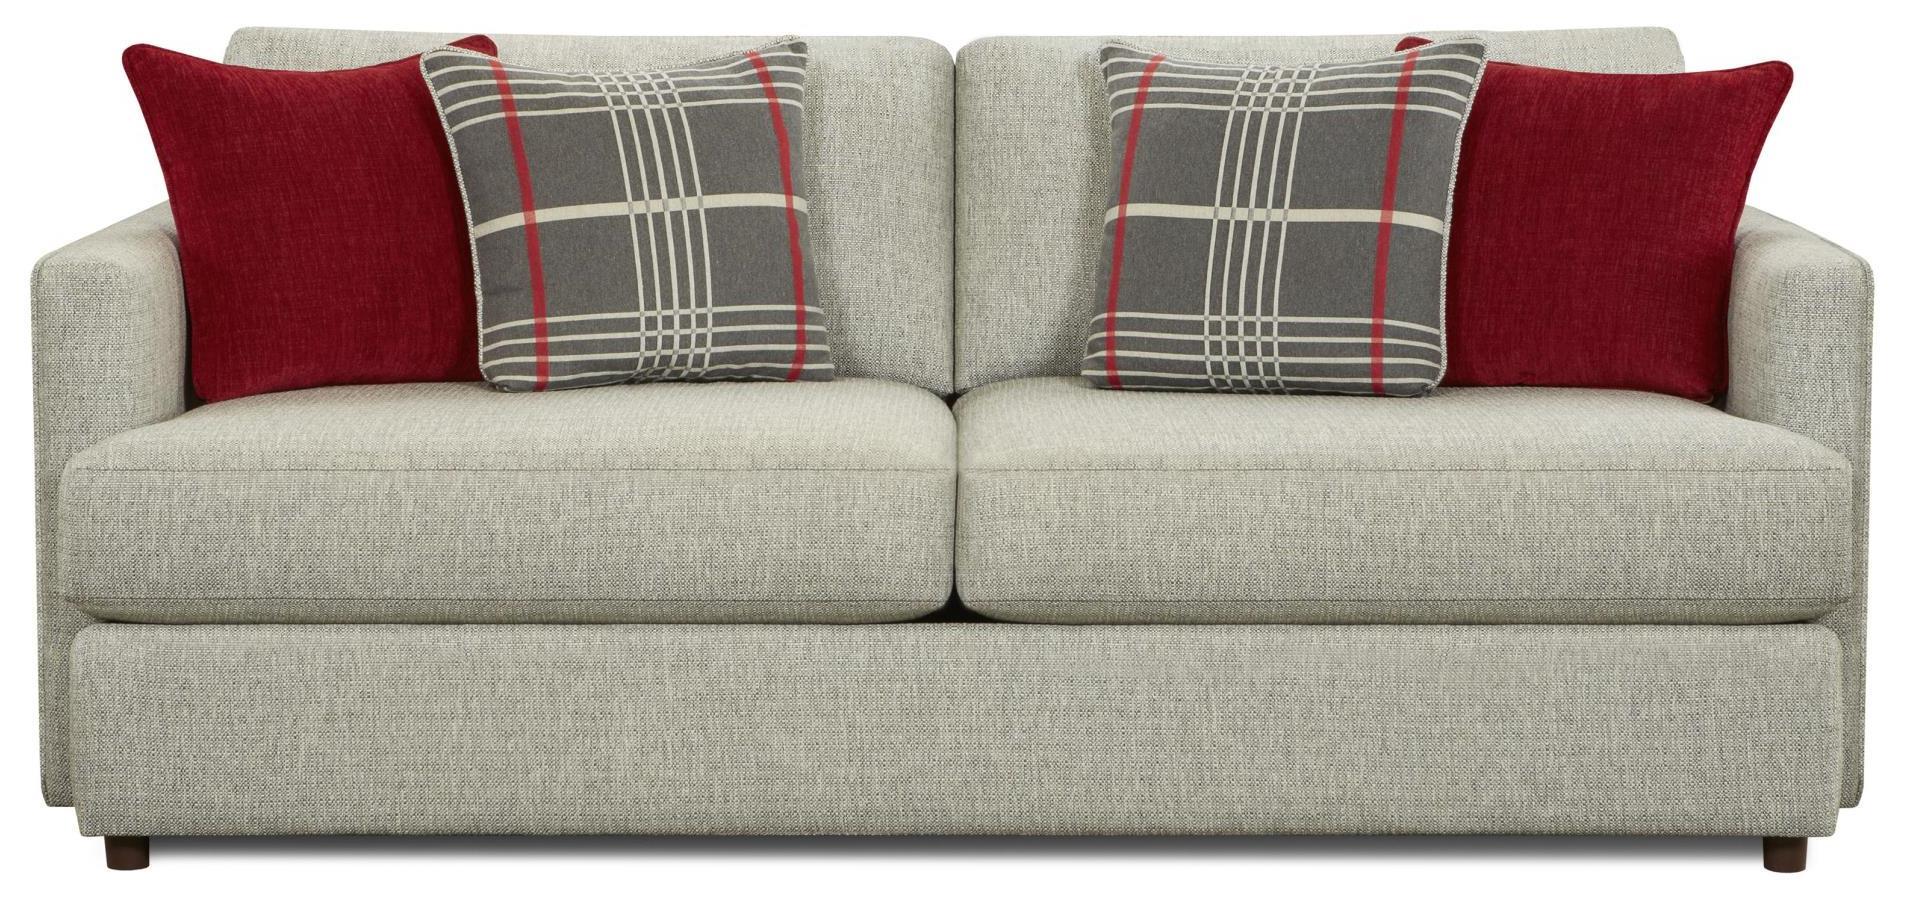 Fusion Furniture Greenwich Sofa - Item Number: 1800Sugarshack Metal